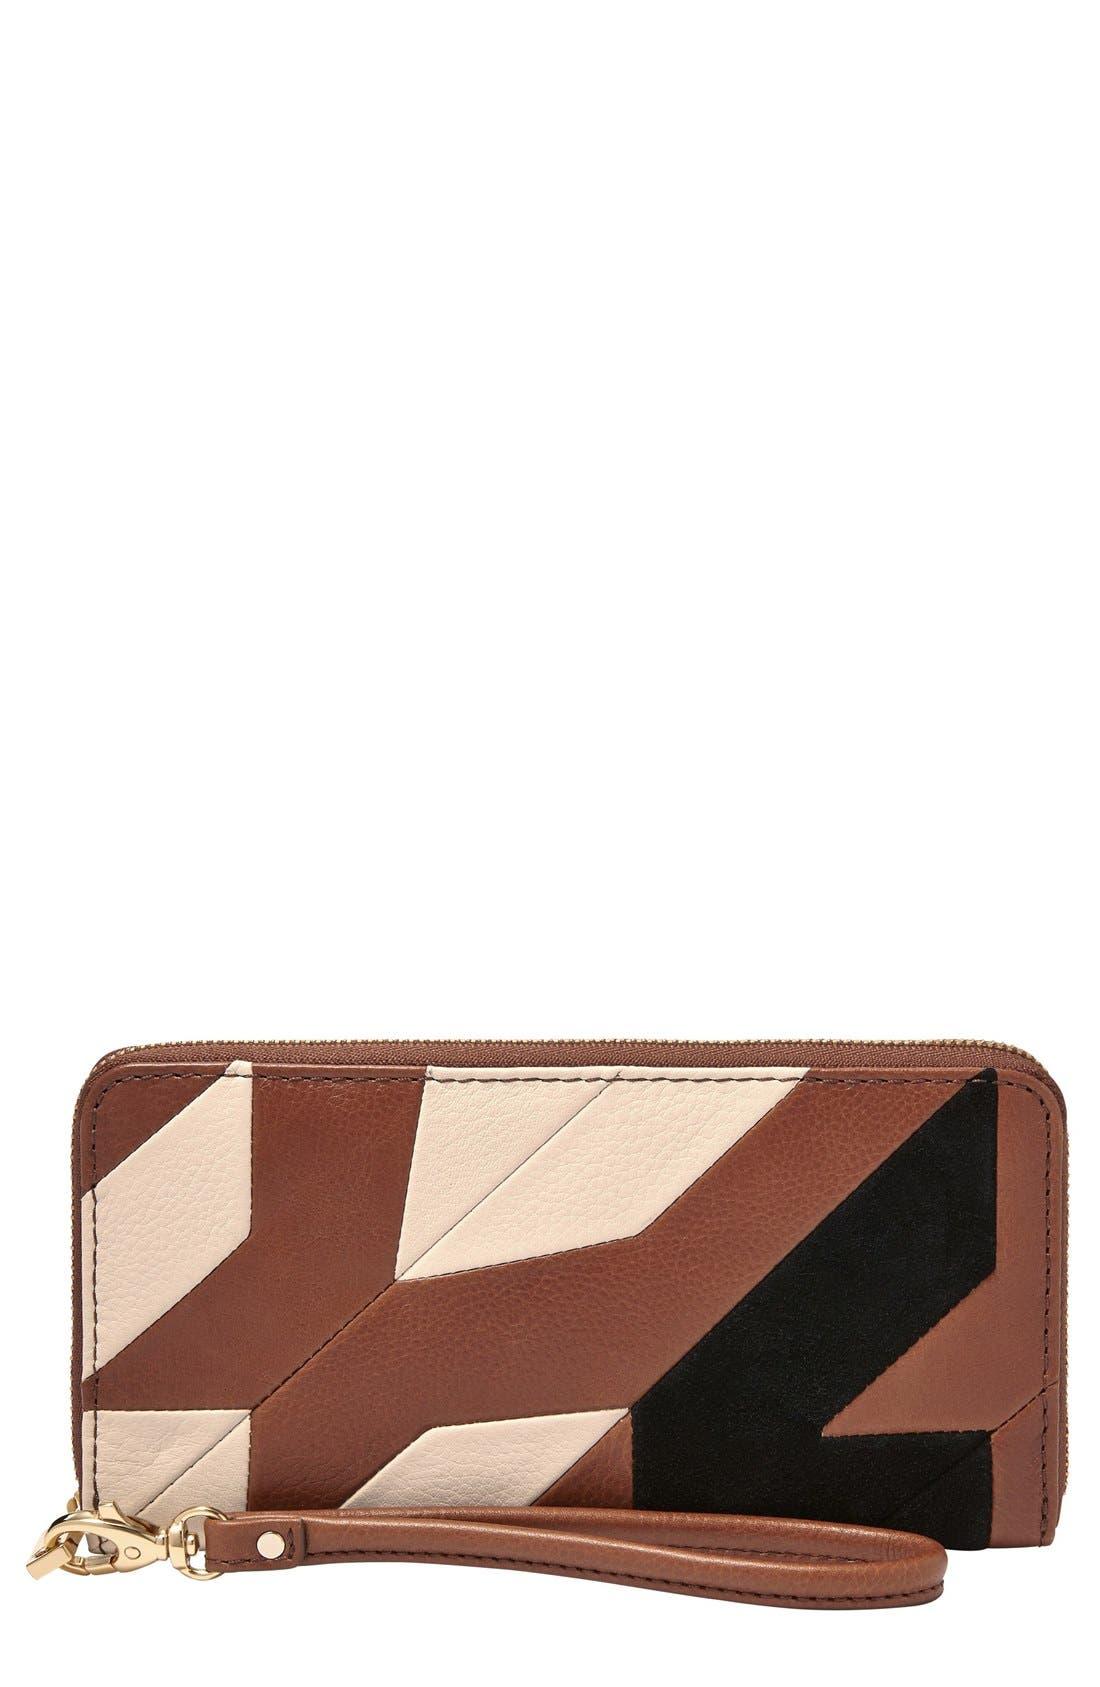 Main Image - Fossil 'Sydney' Colorblock Zip Clutch Wallet